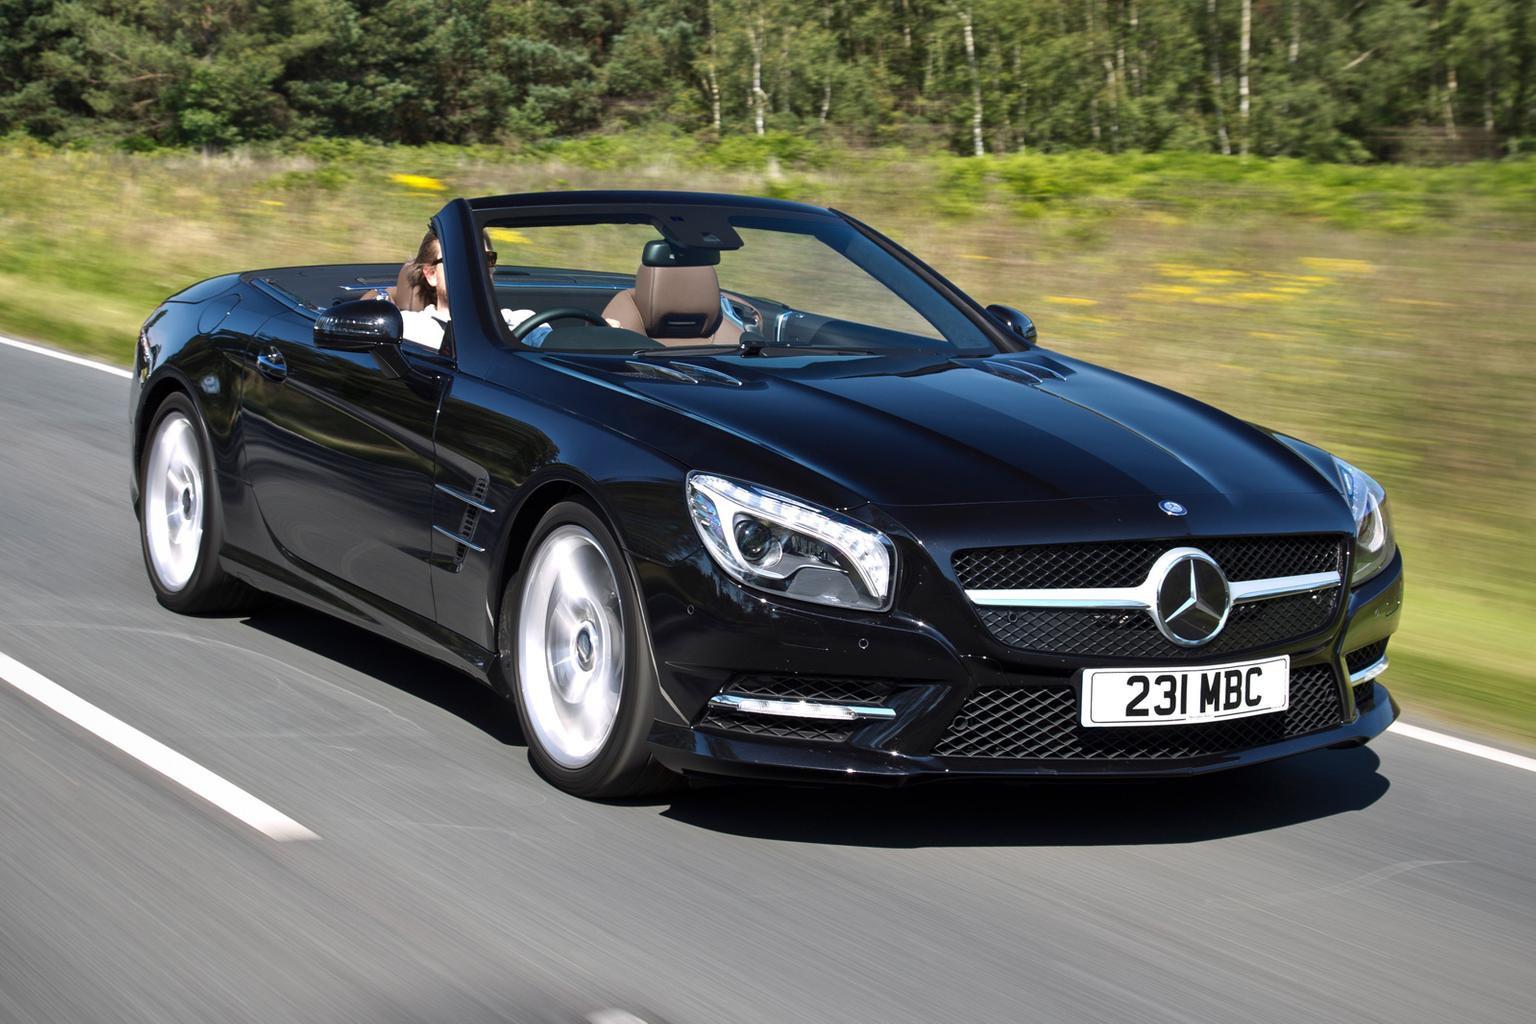 News round-up: Mercedes SL400 on sale, plus Bentley reveals its first hybrid concept